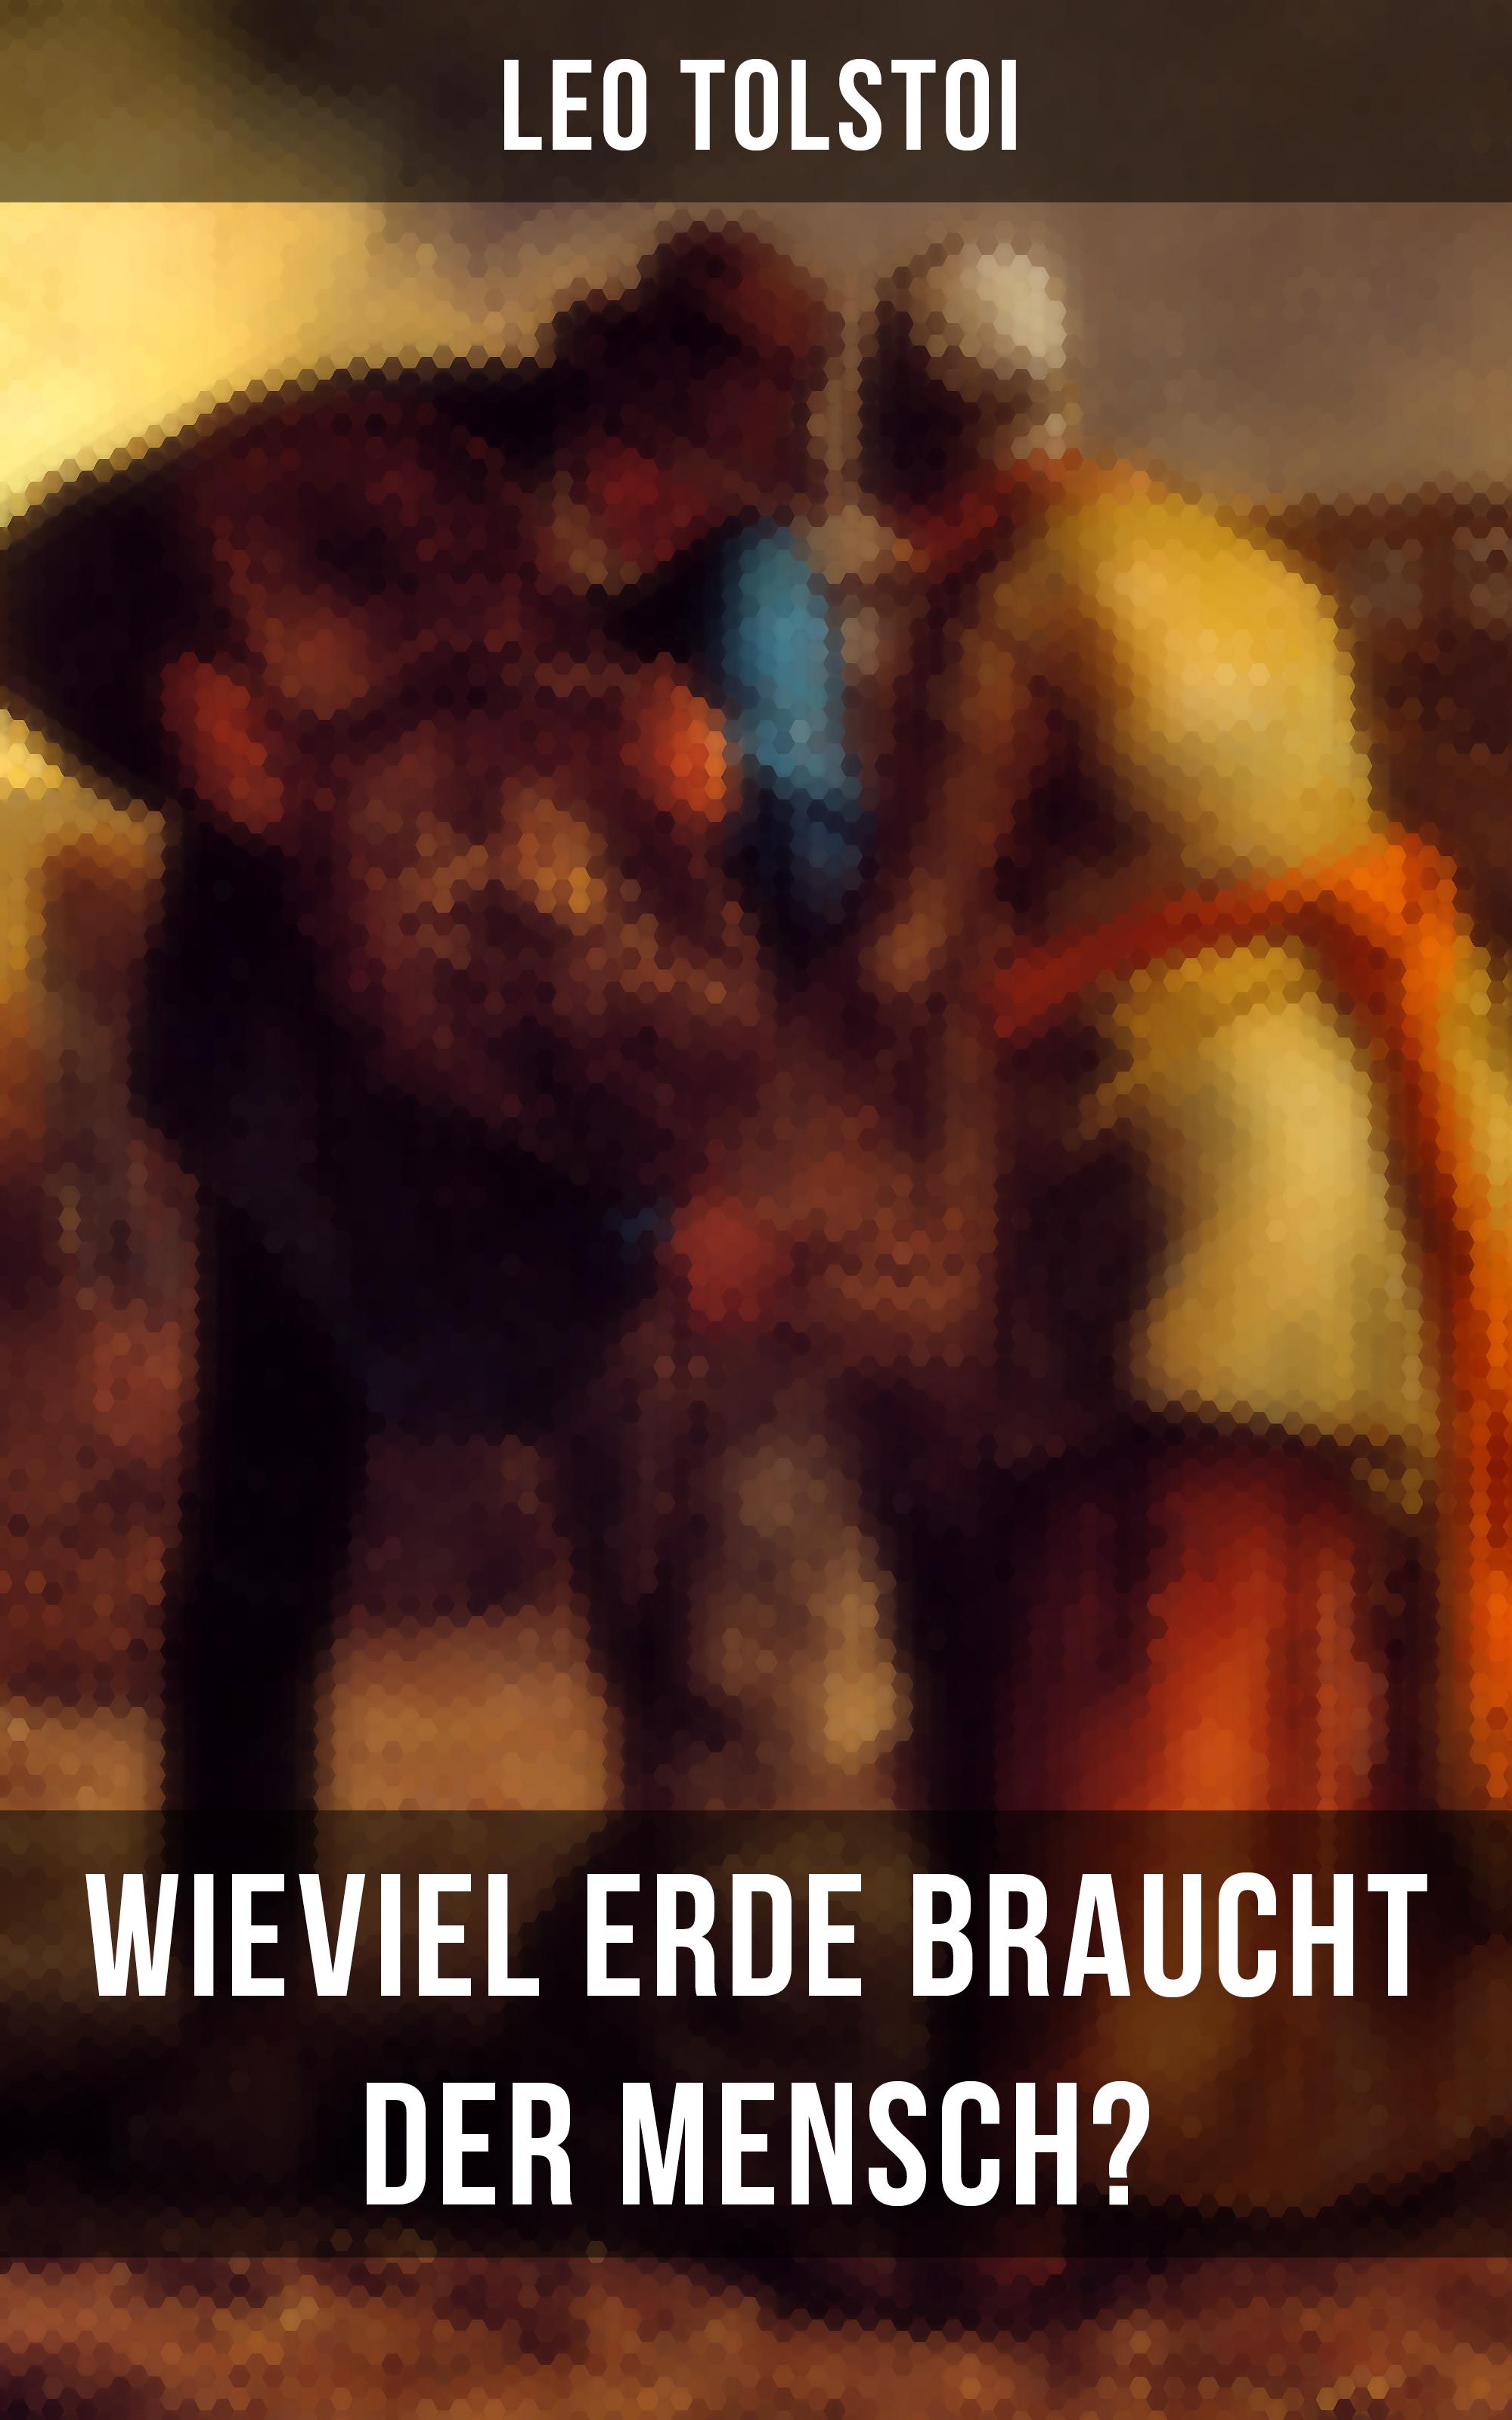 Leo Tolstoi Leo Tolstoi: Wieviel Erde braucht der Mensch? лев толстой tolstoi for the young select tales from tolstoi